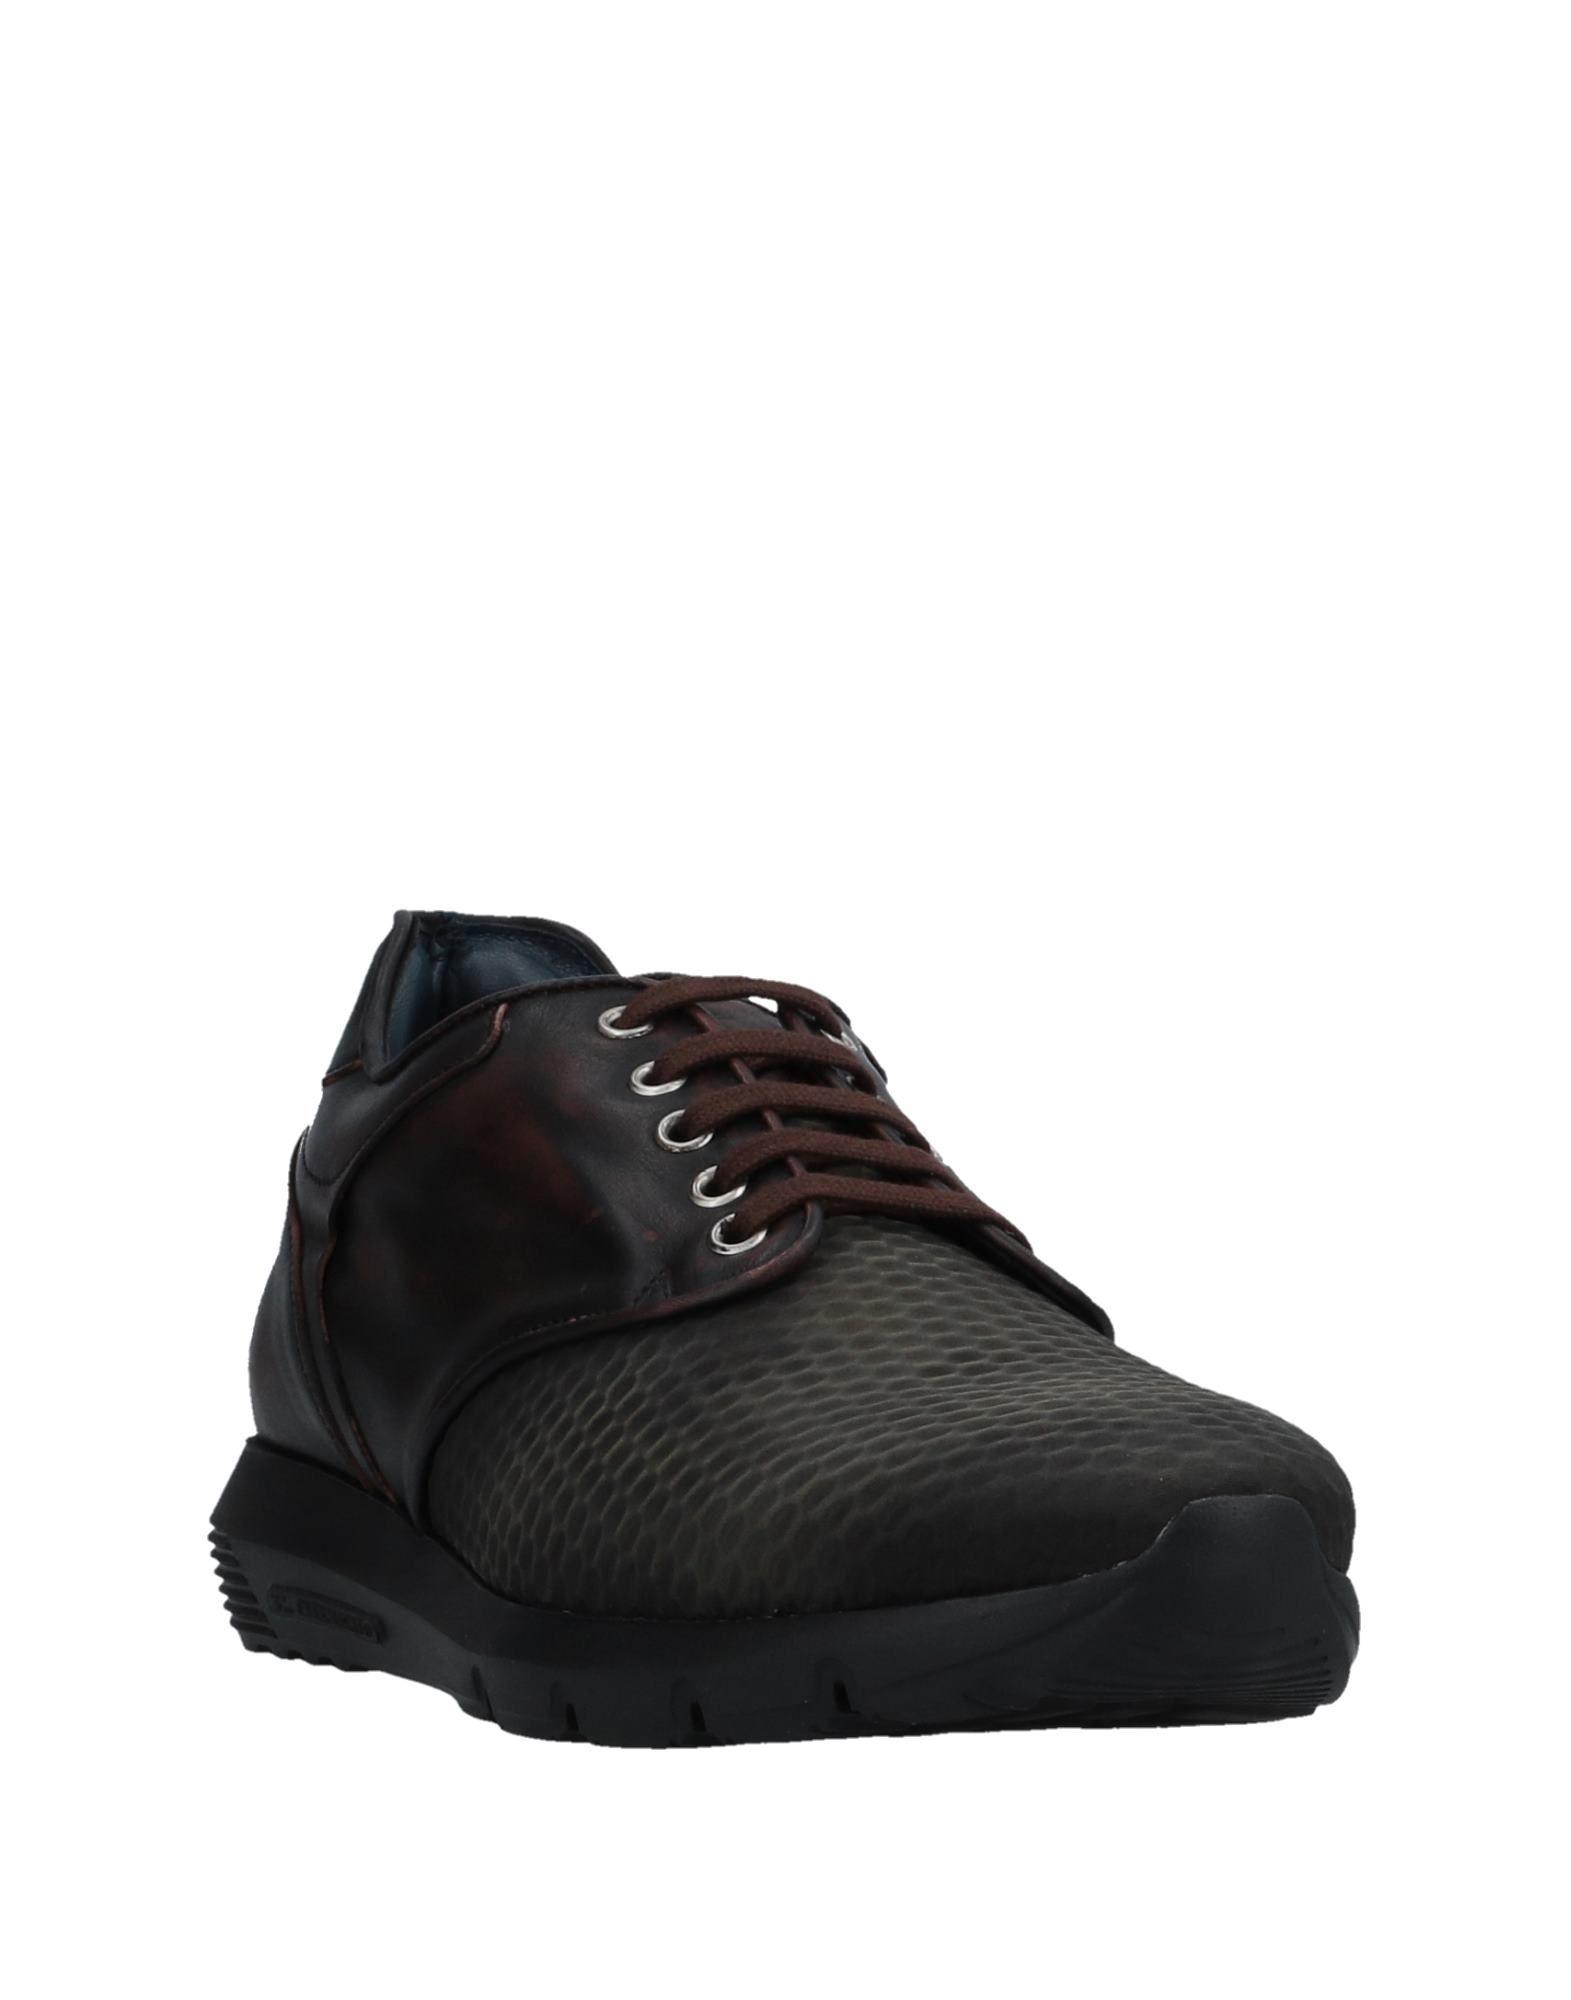 Rabatt Sneakers echte Schuhe Fabiano Ricci Sneakers Rabatt Herren  11508954XM 6a55c3